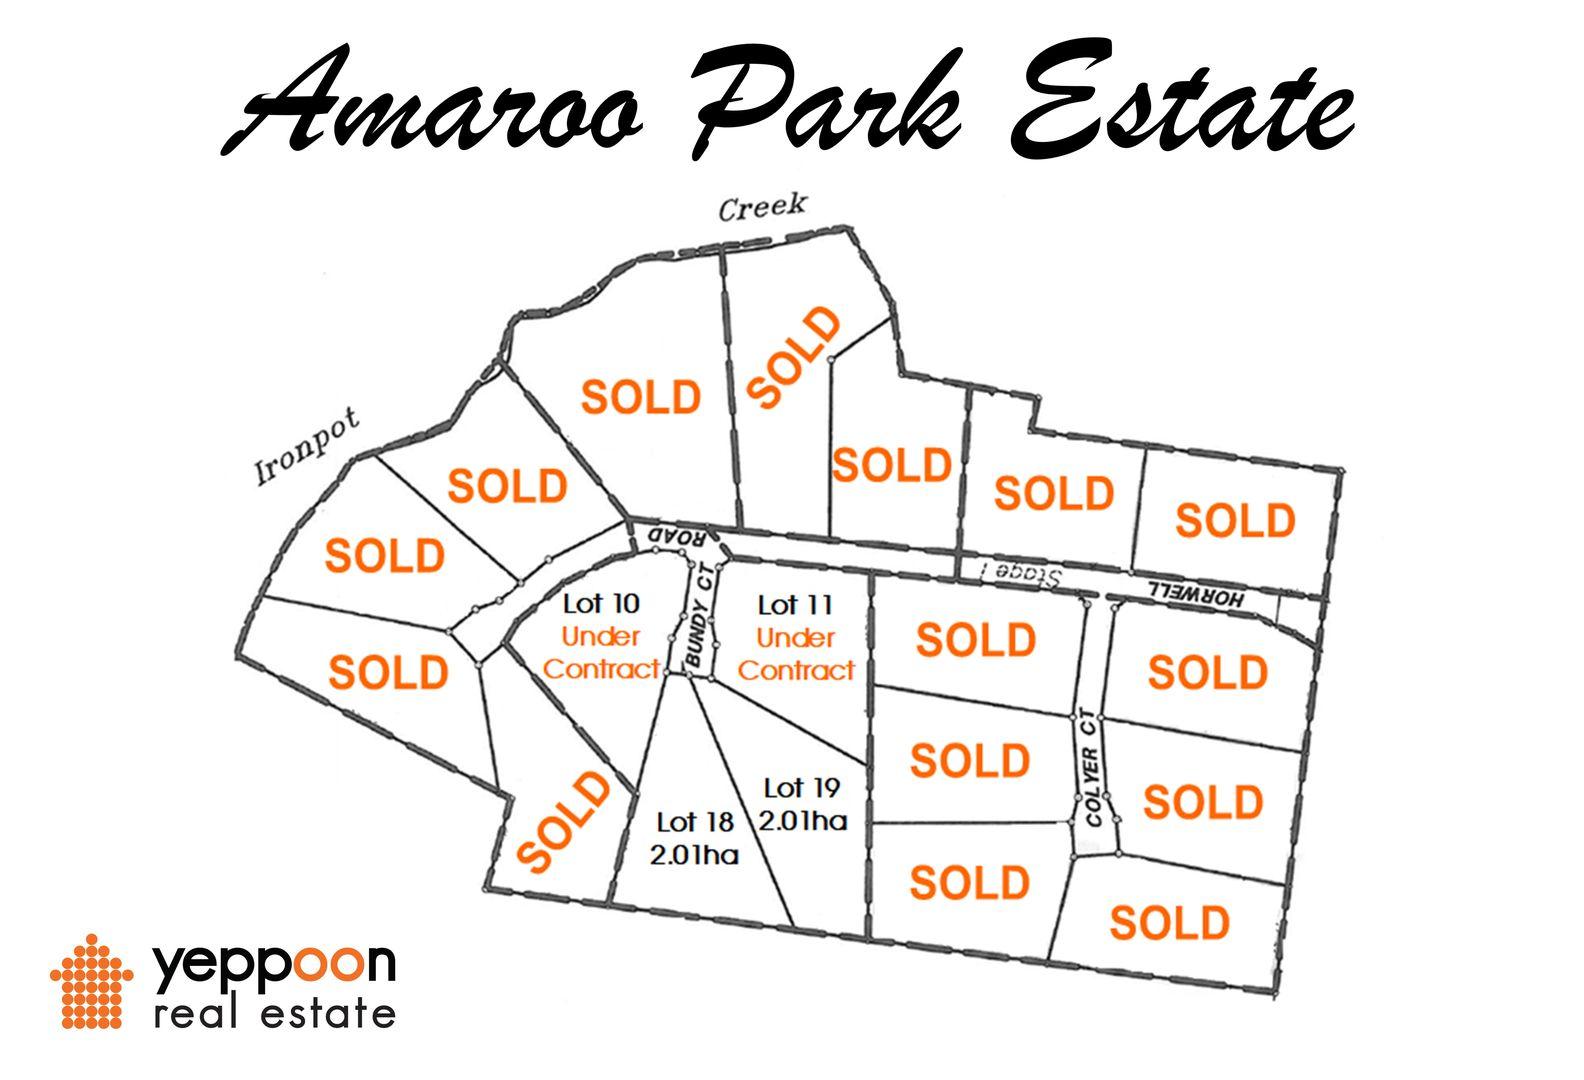 1 Amaroo Park Estate, Horwell Road, Ironpot QLD 4701, Image 1